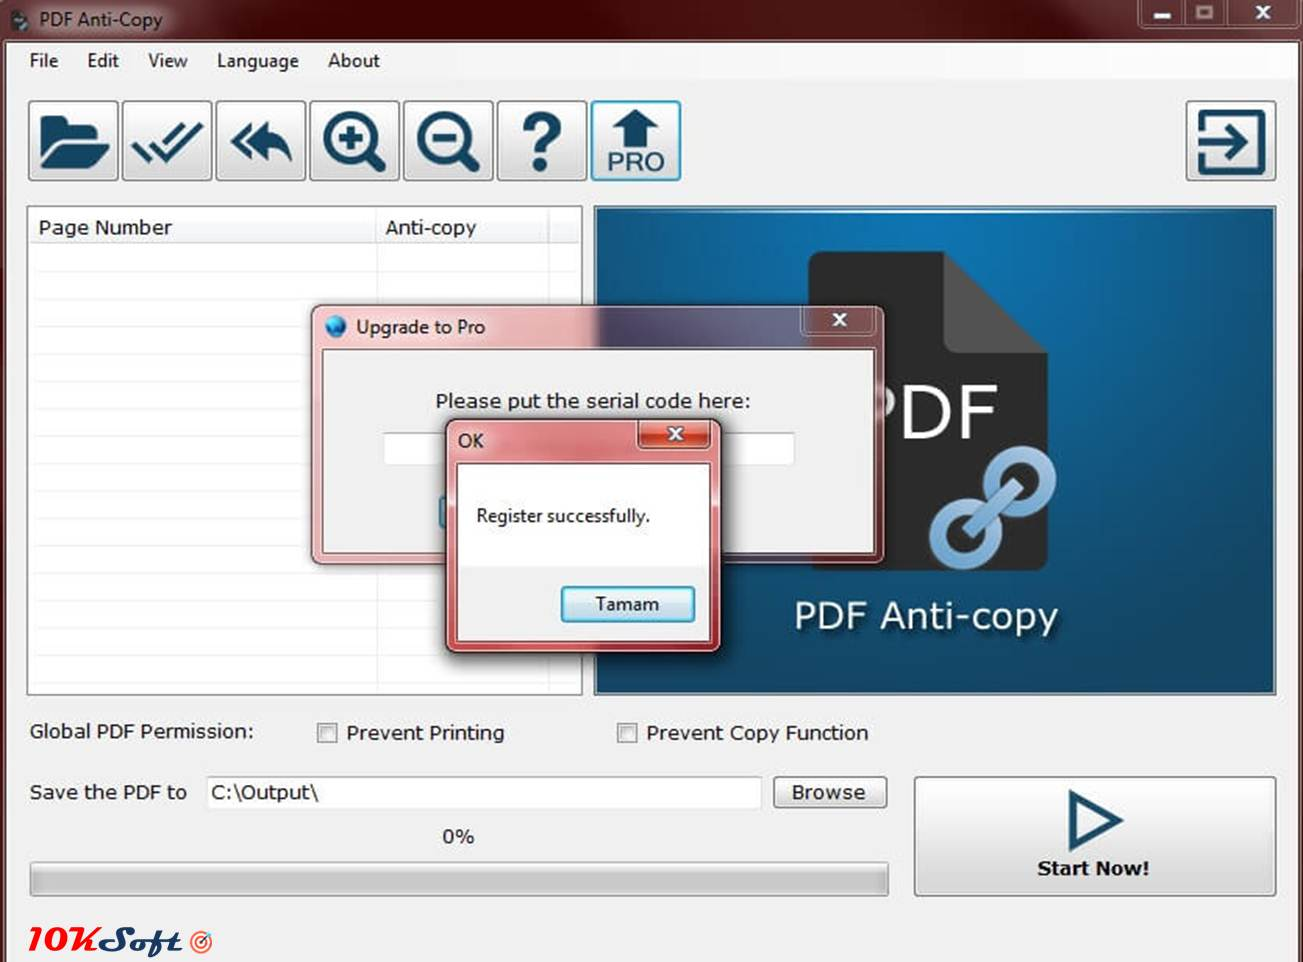 PDF Anti-Copy Latest Version Direct Download Link